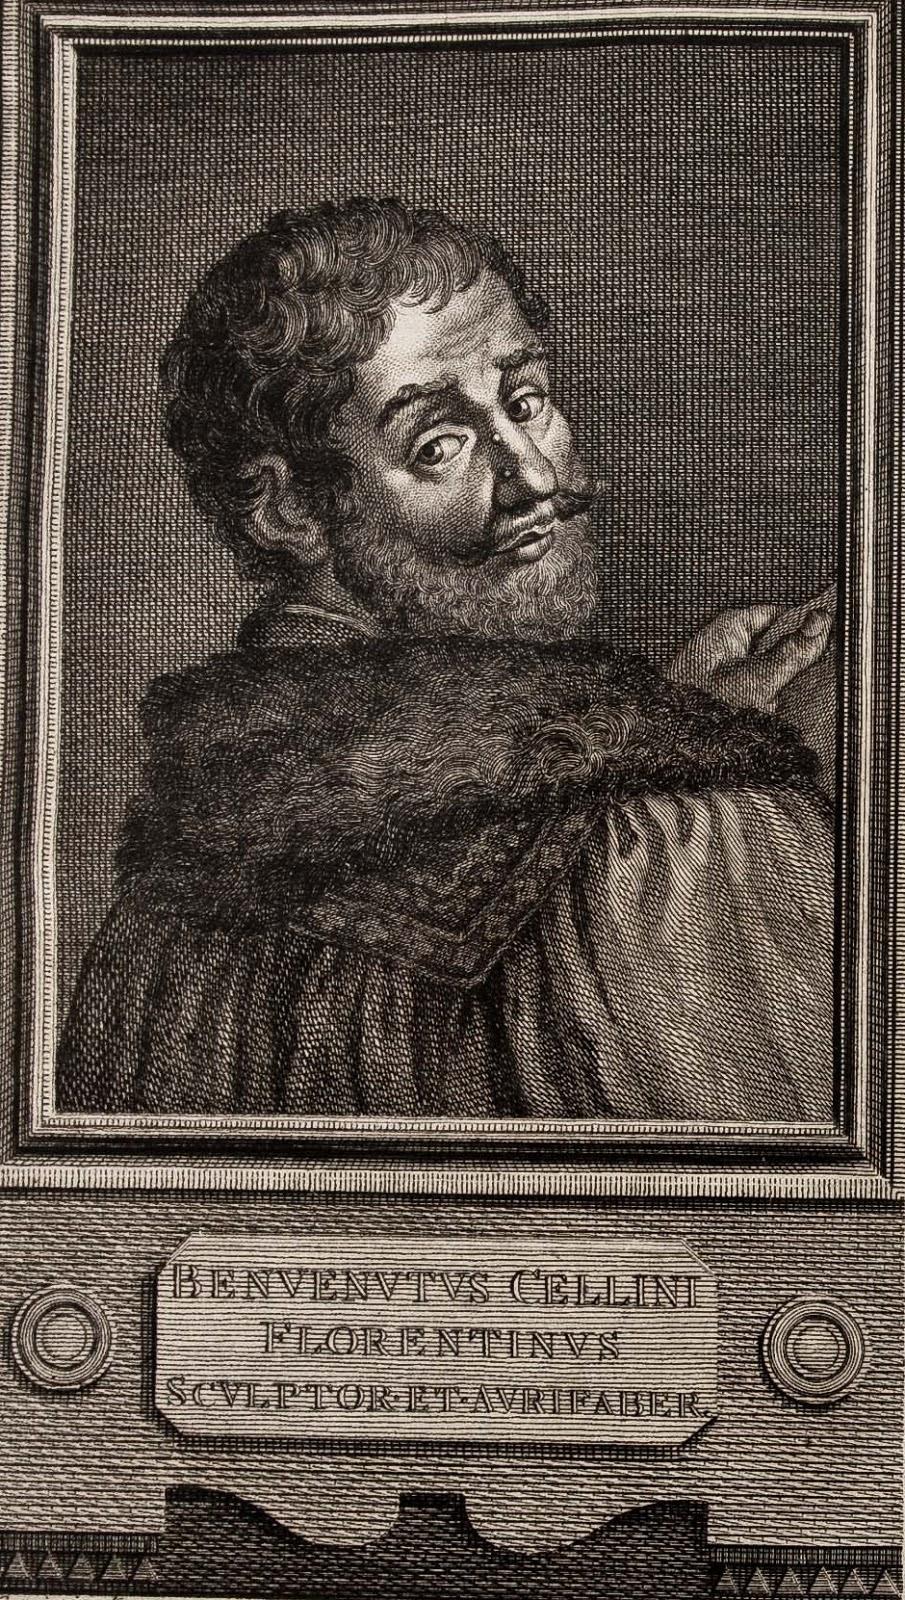 Benvenuto Cellini  Perseus with the Head of Medusa, c. 1554 (28).jpg